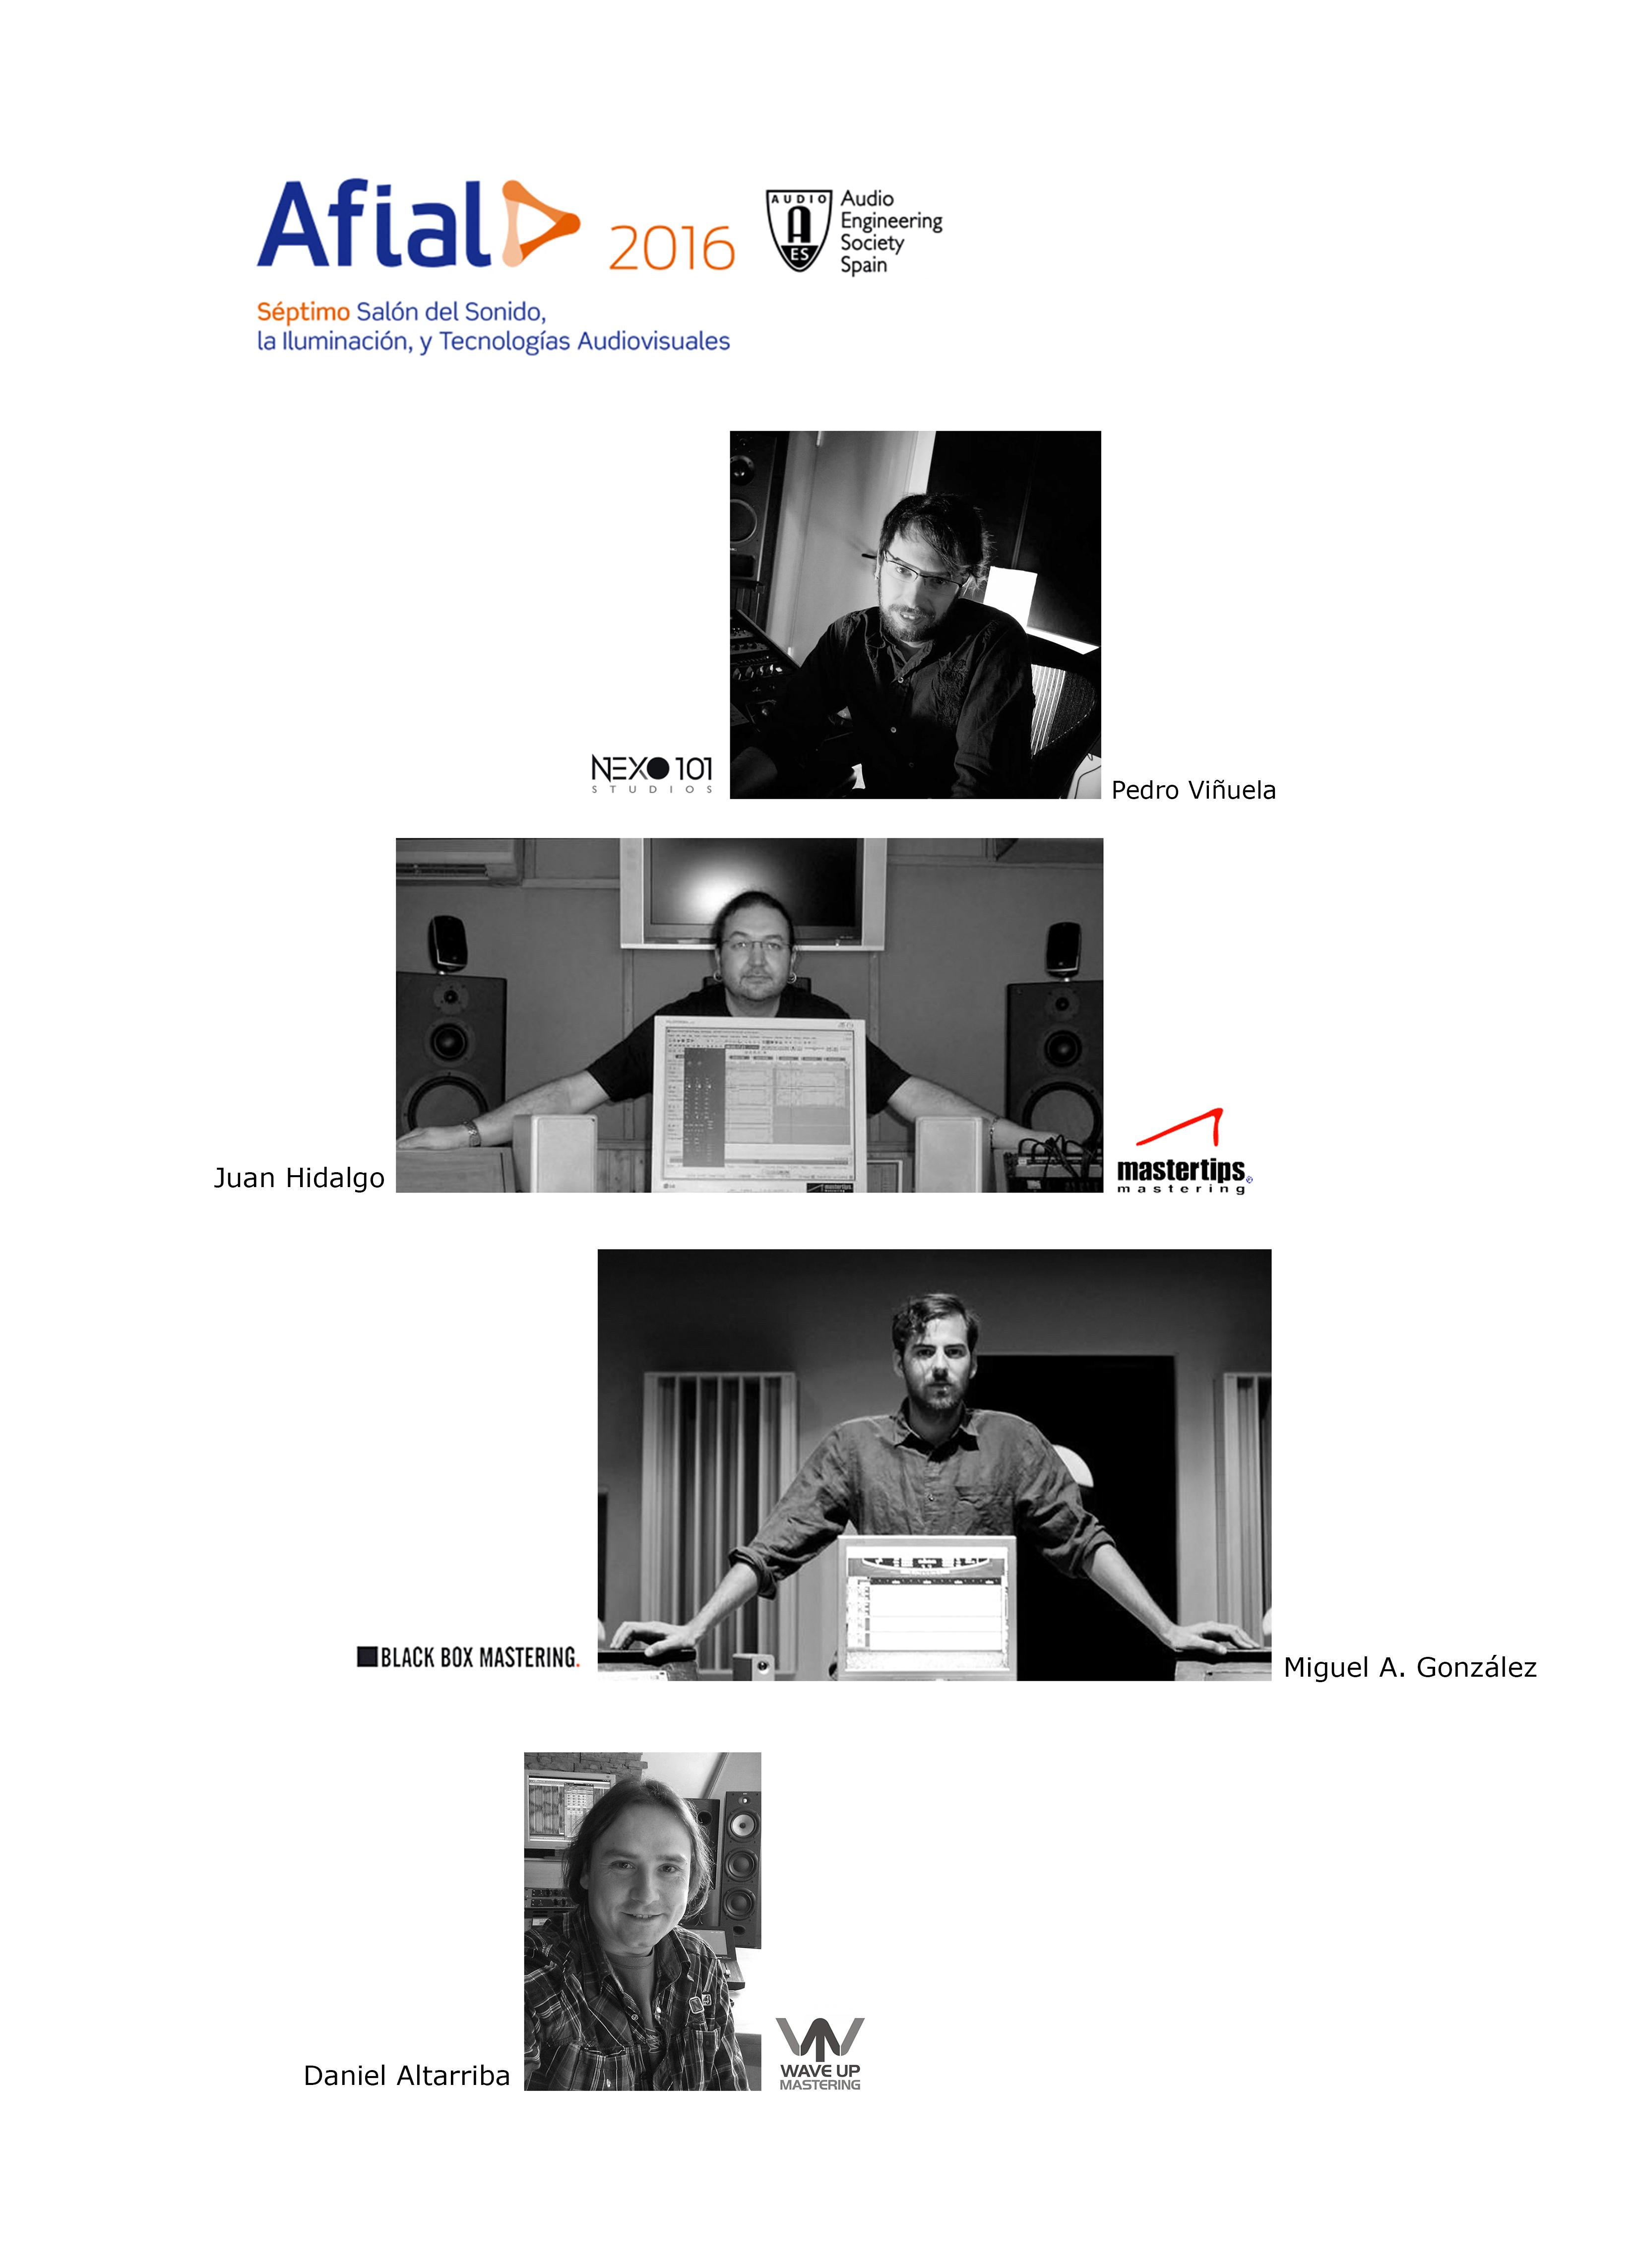 Mesa redonda Mastering AES-AFIAL